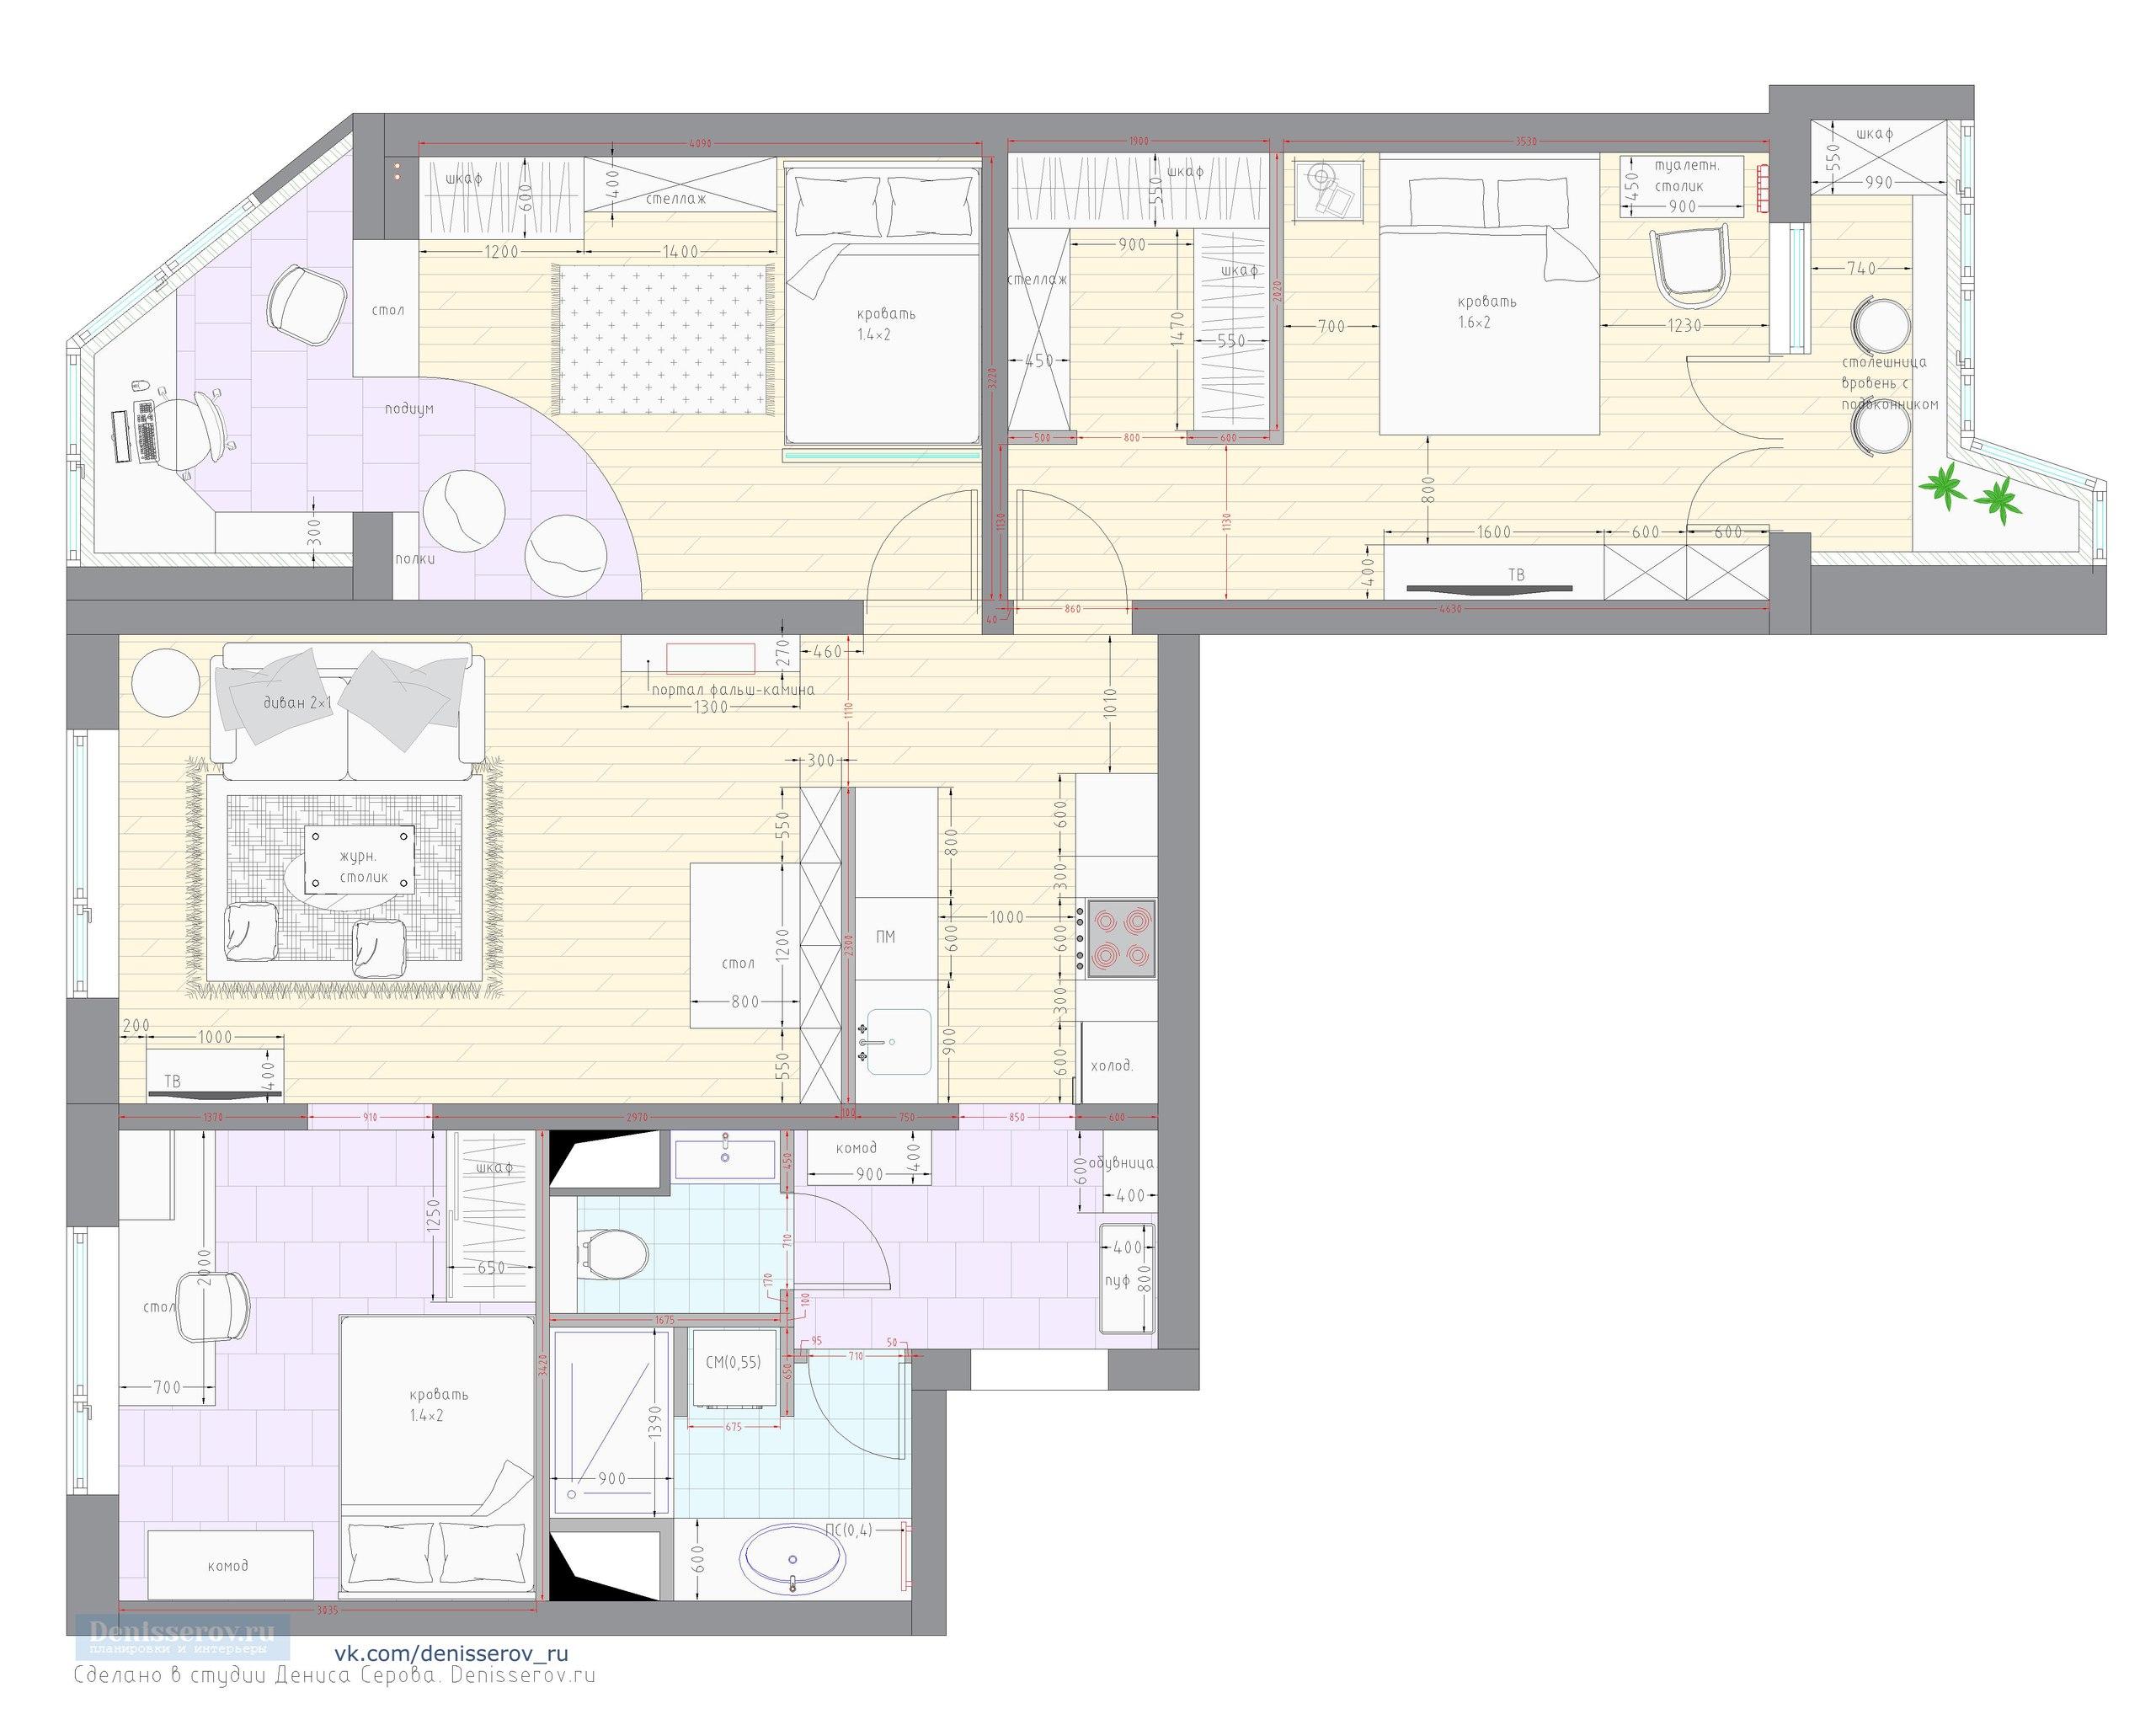 планировка трехкомнатной квартиры п-44т